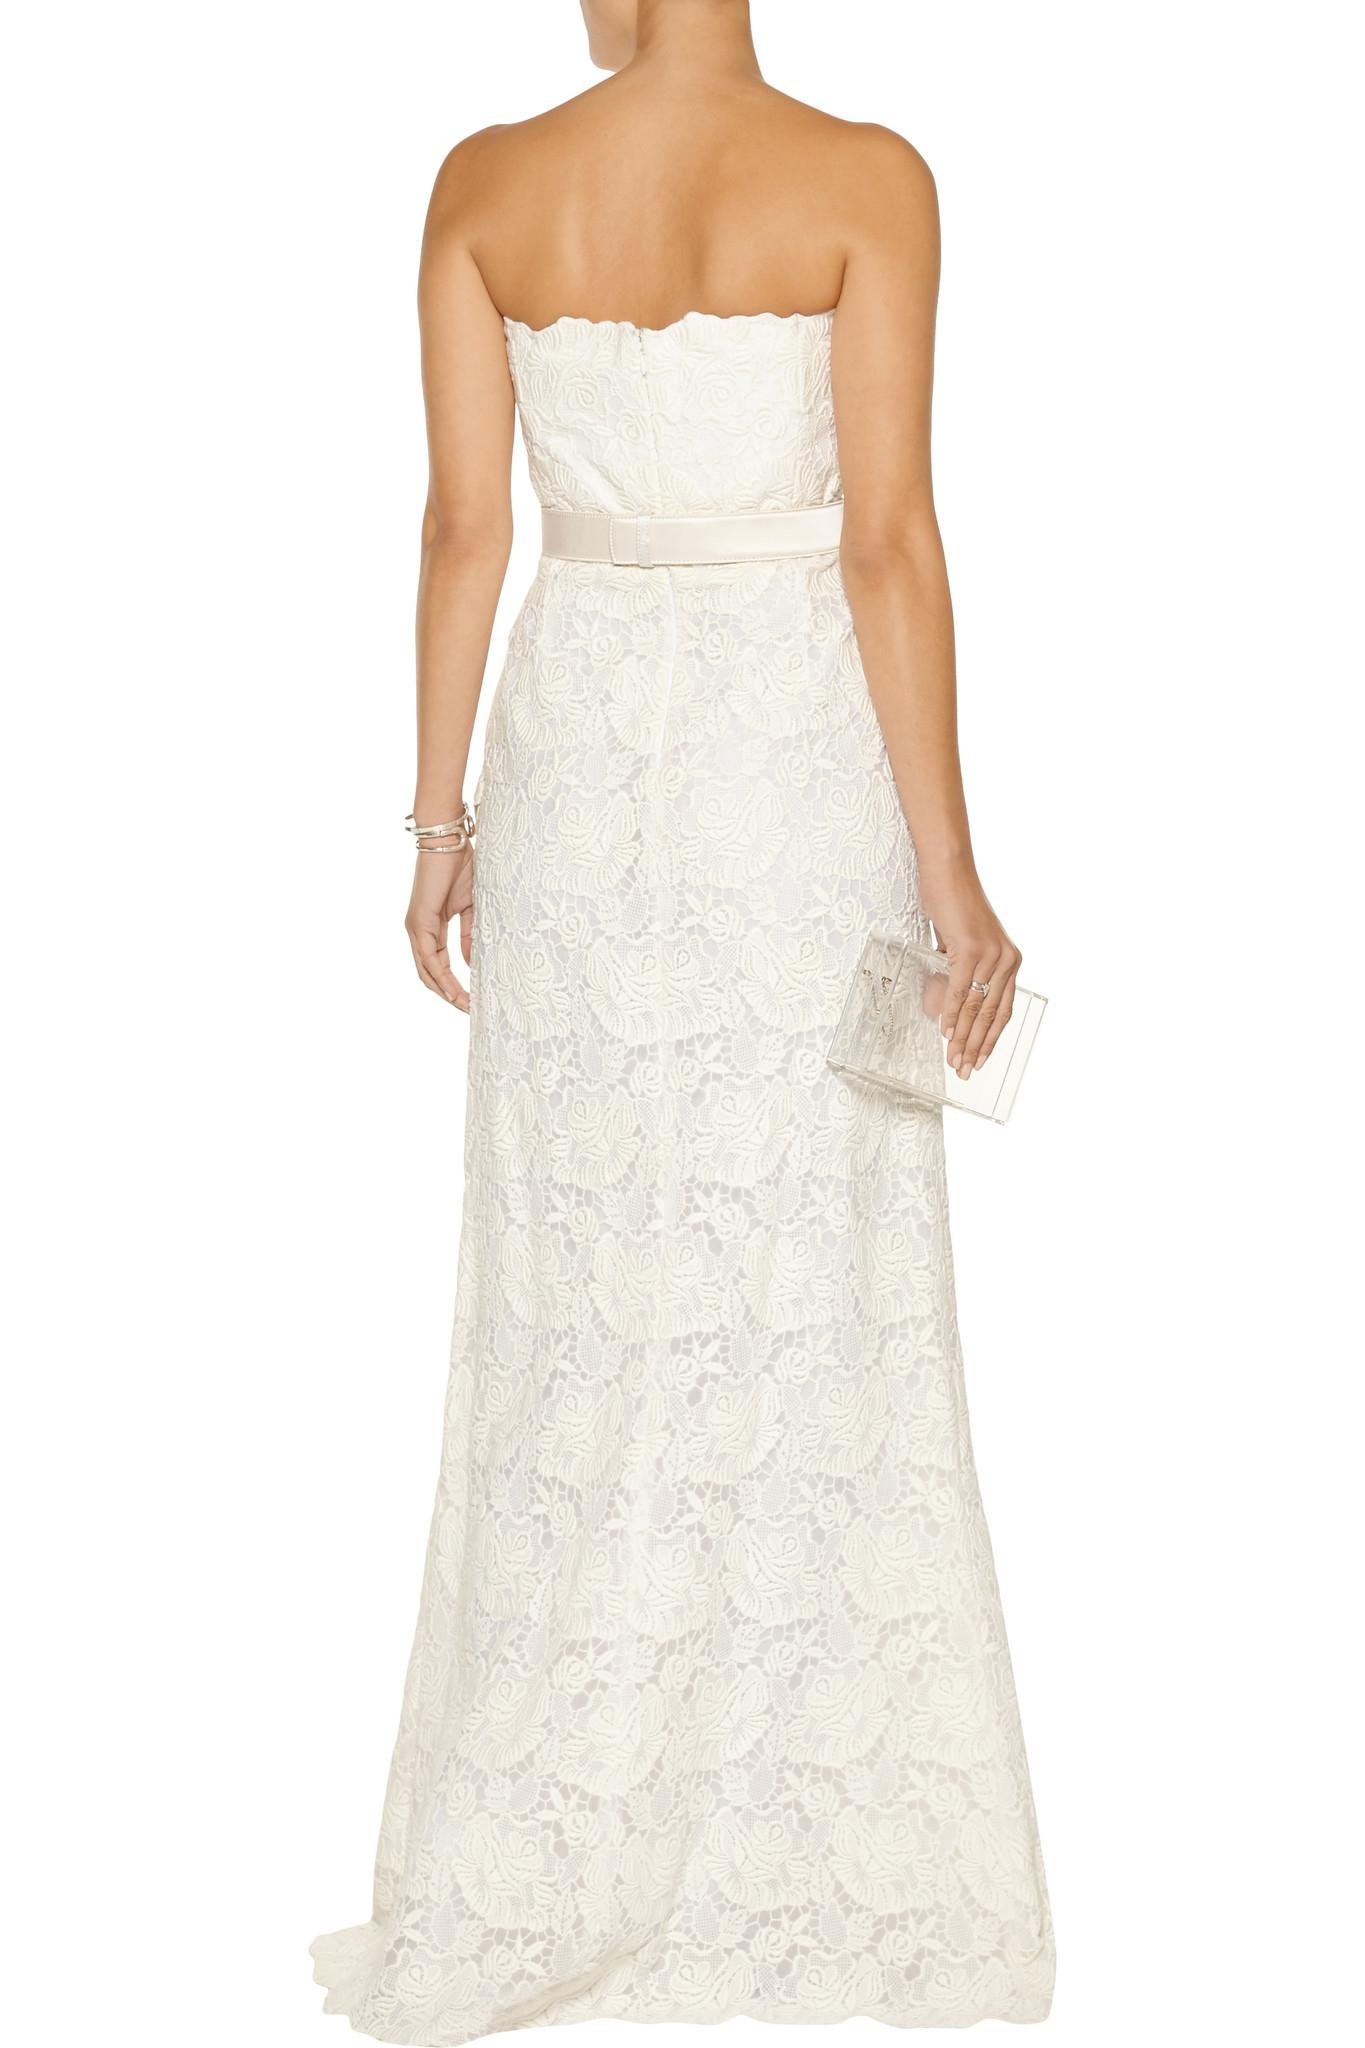 White - Ivory - 100 Polyester Satin Gown - GWN 11 IV White - Ivory - 100 Polyester Satin Gown - GWN 11 IV new picture